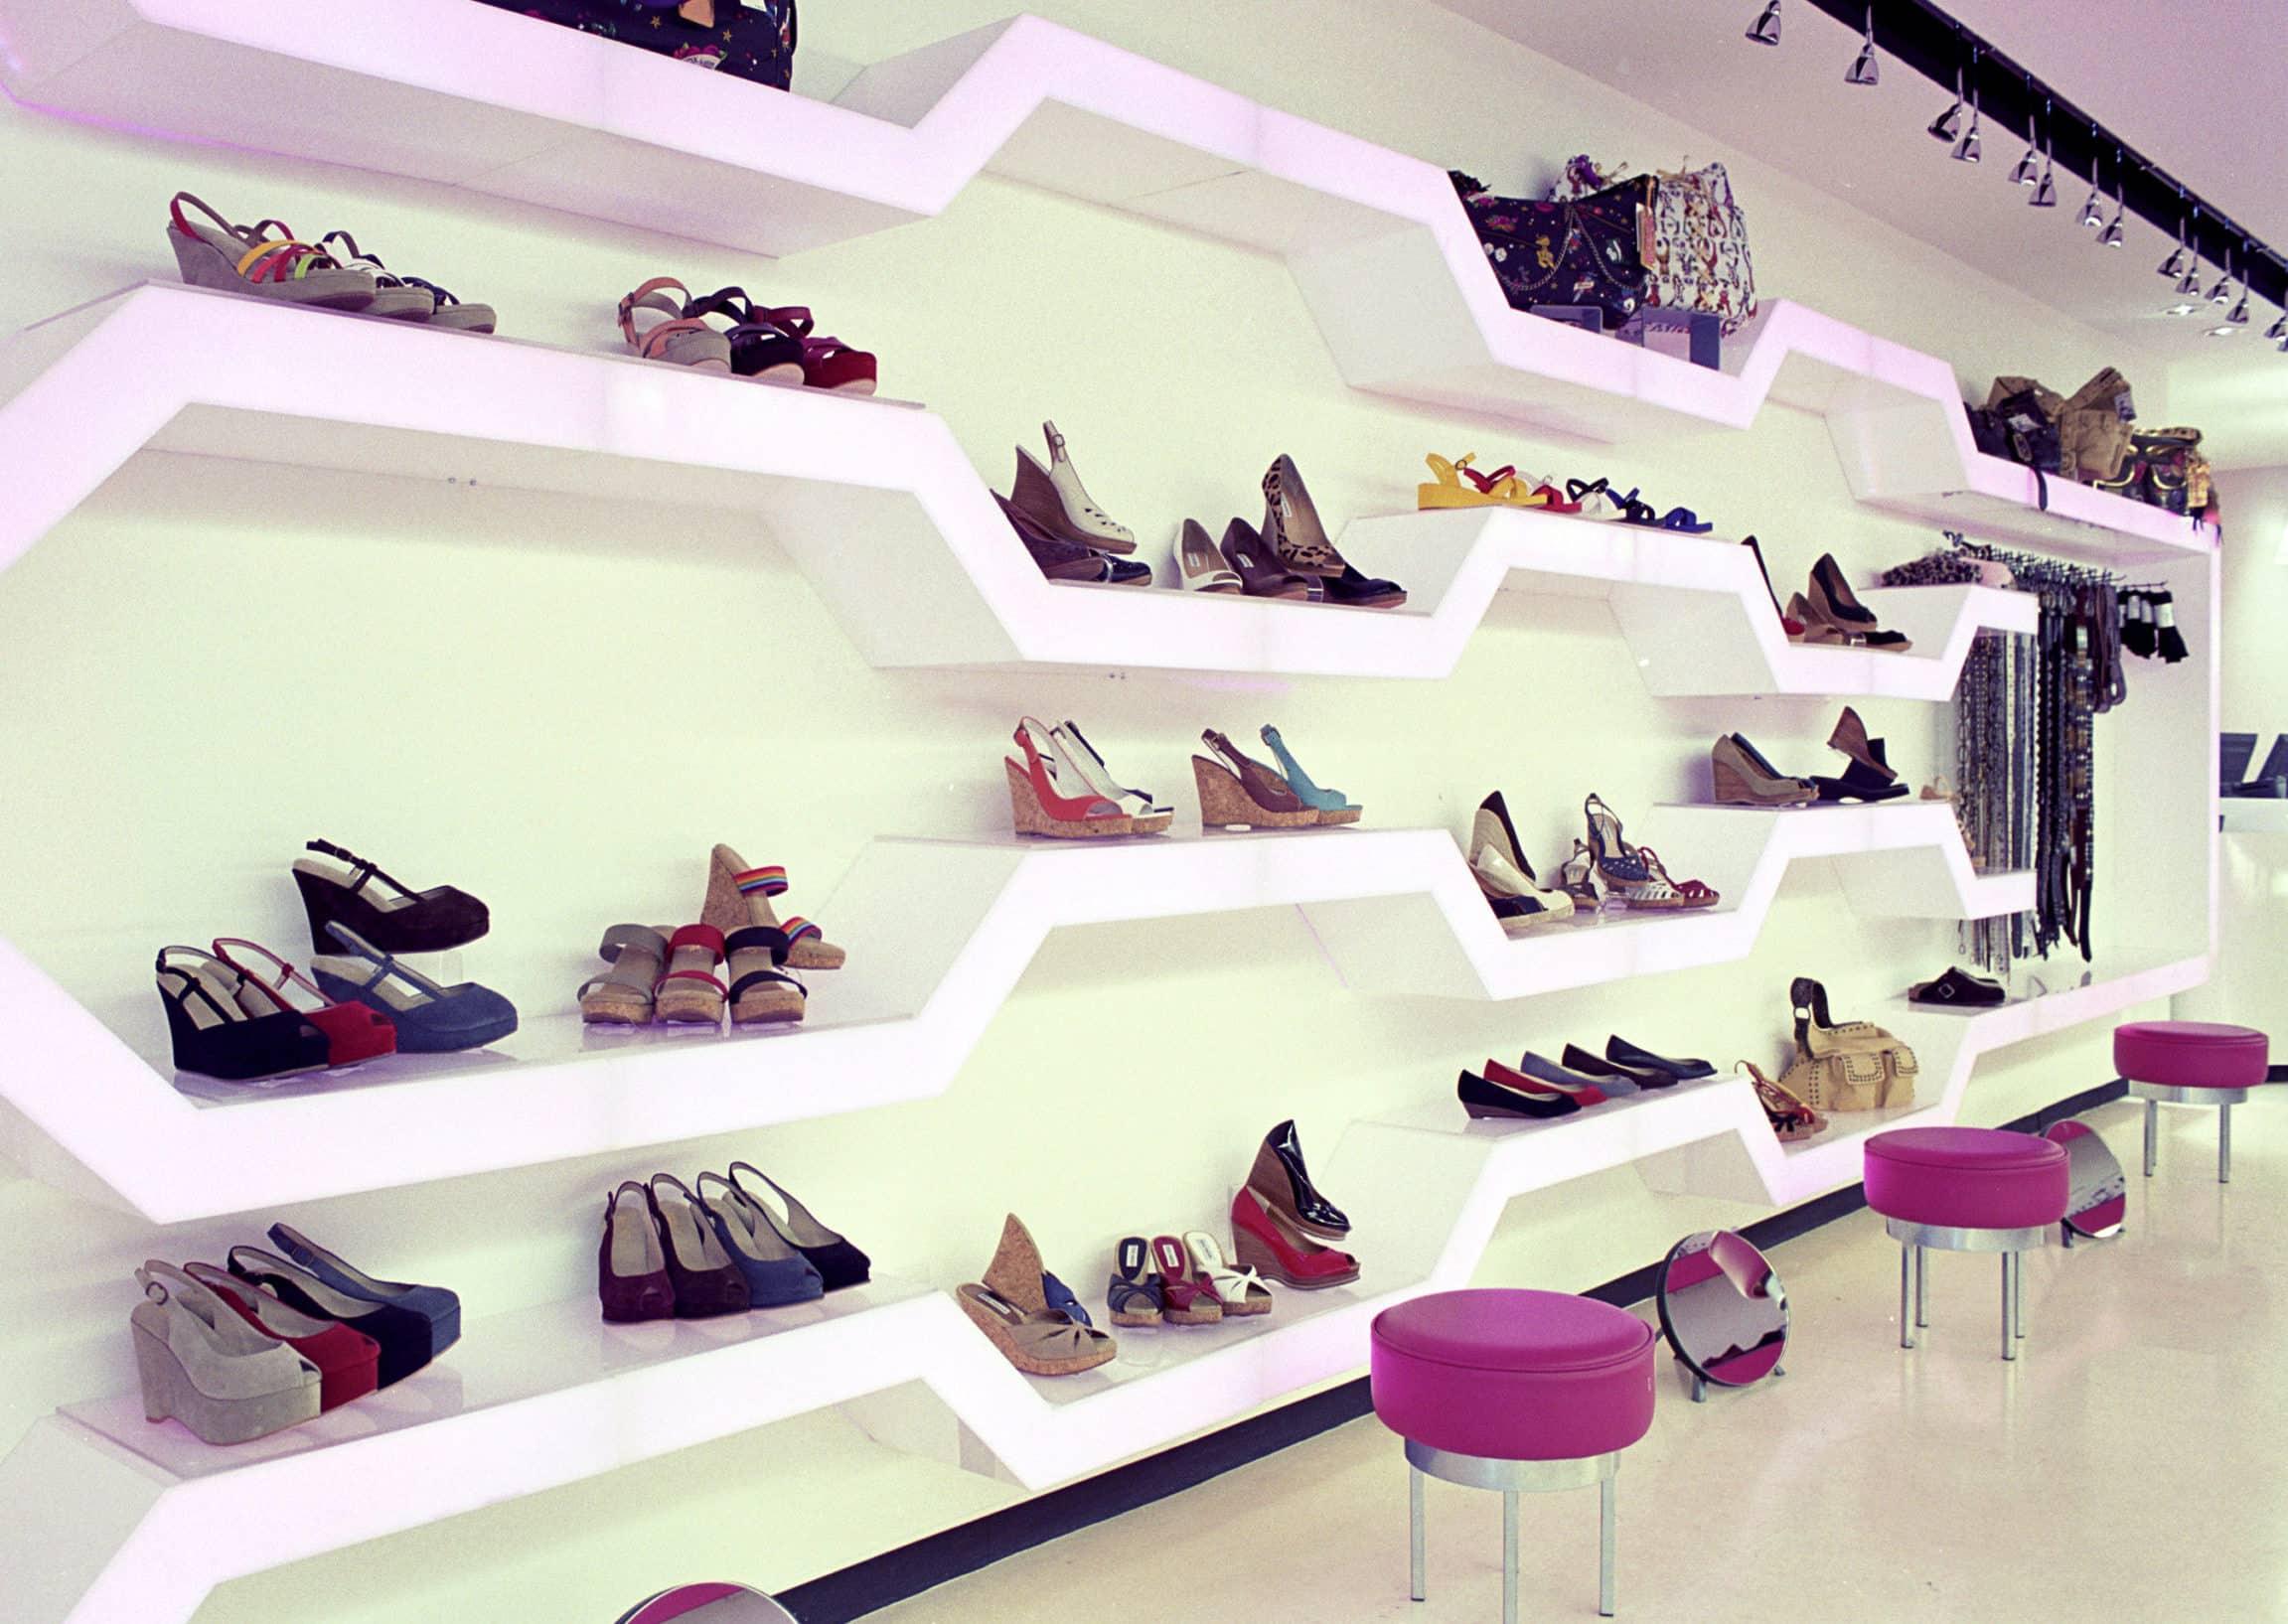 Merchandise display design for the Steve Madden Boutique, Upper East Side, New York